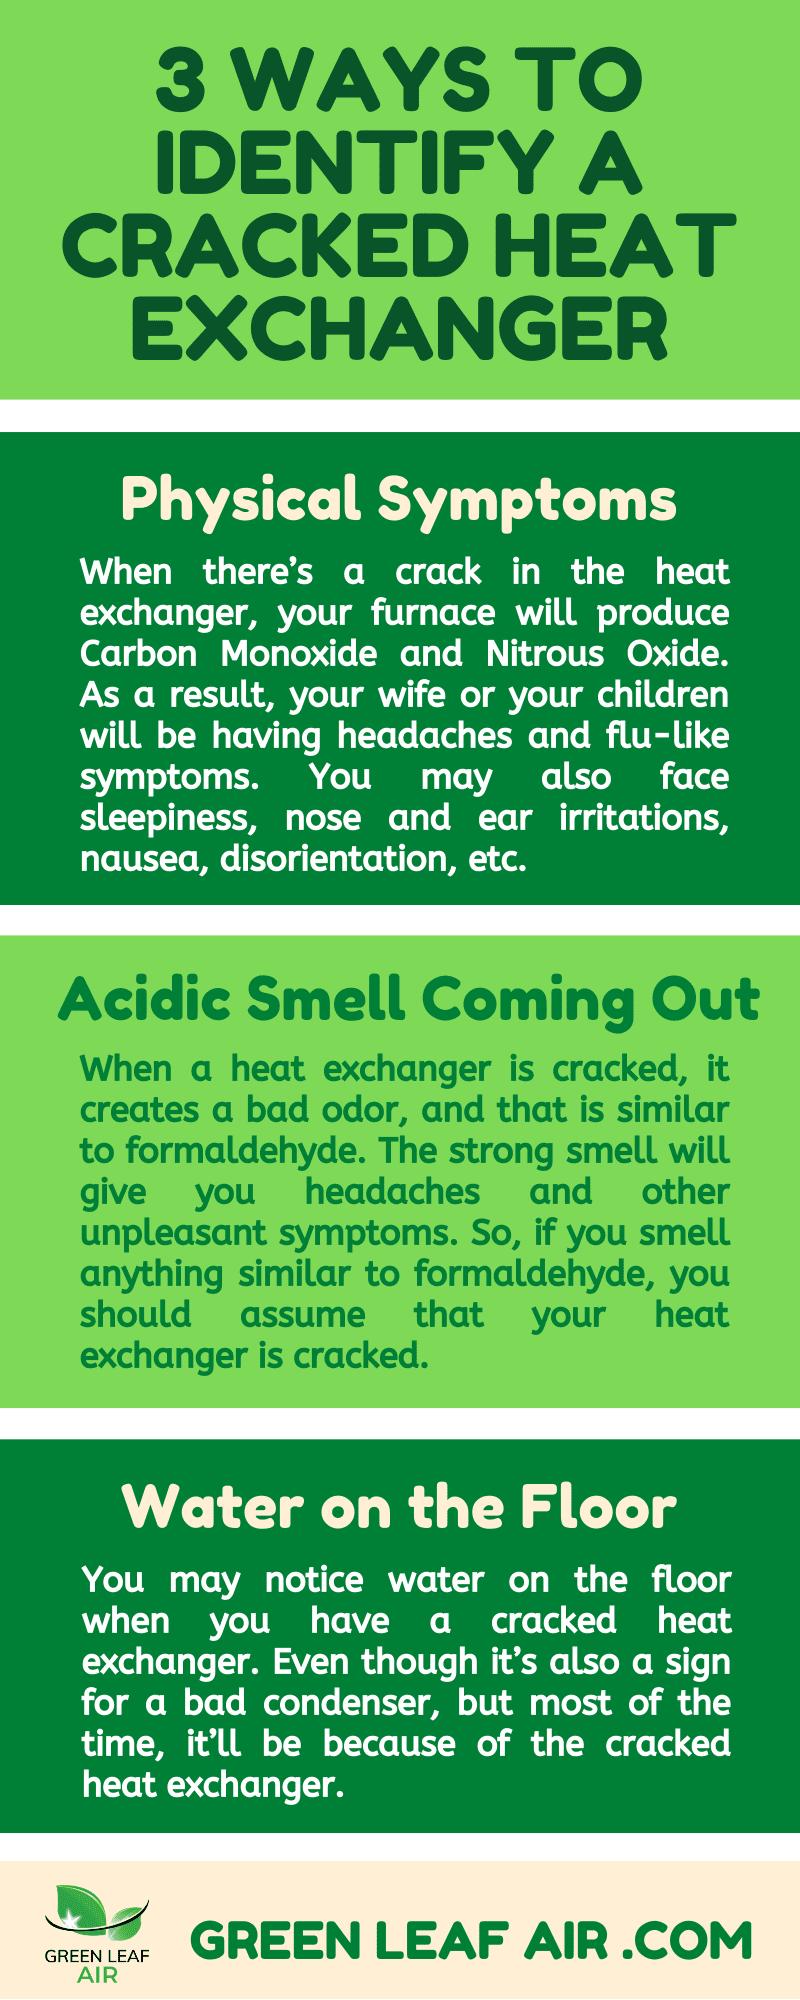 3 Ways to Identify a Cracked Heat Exchanger